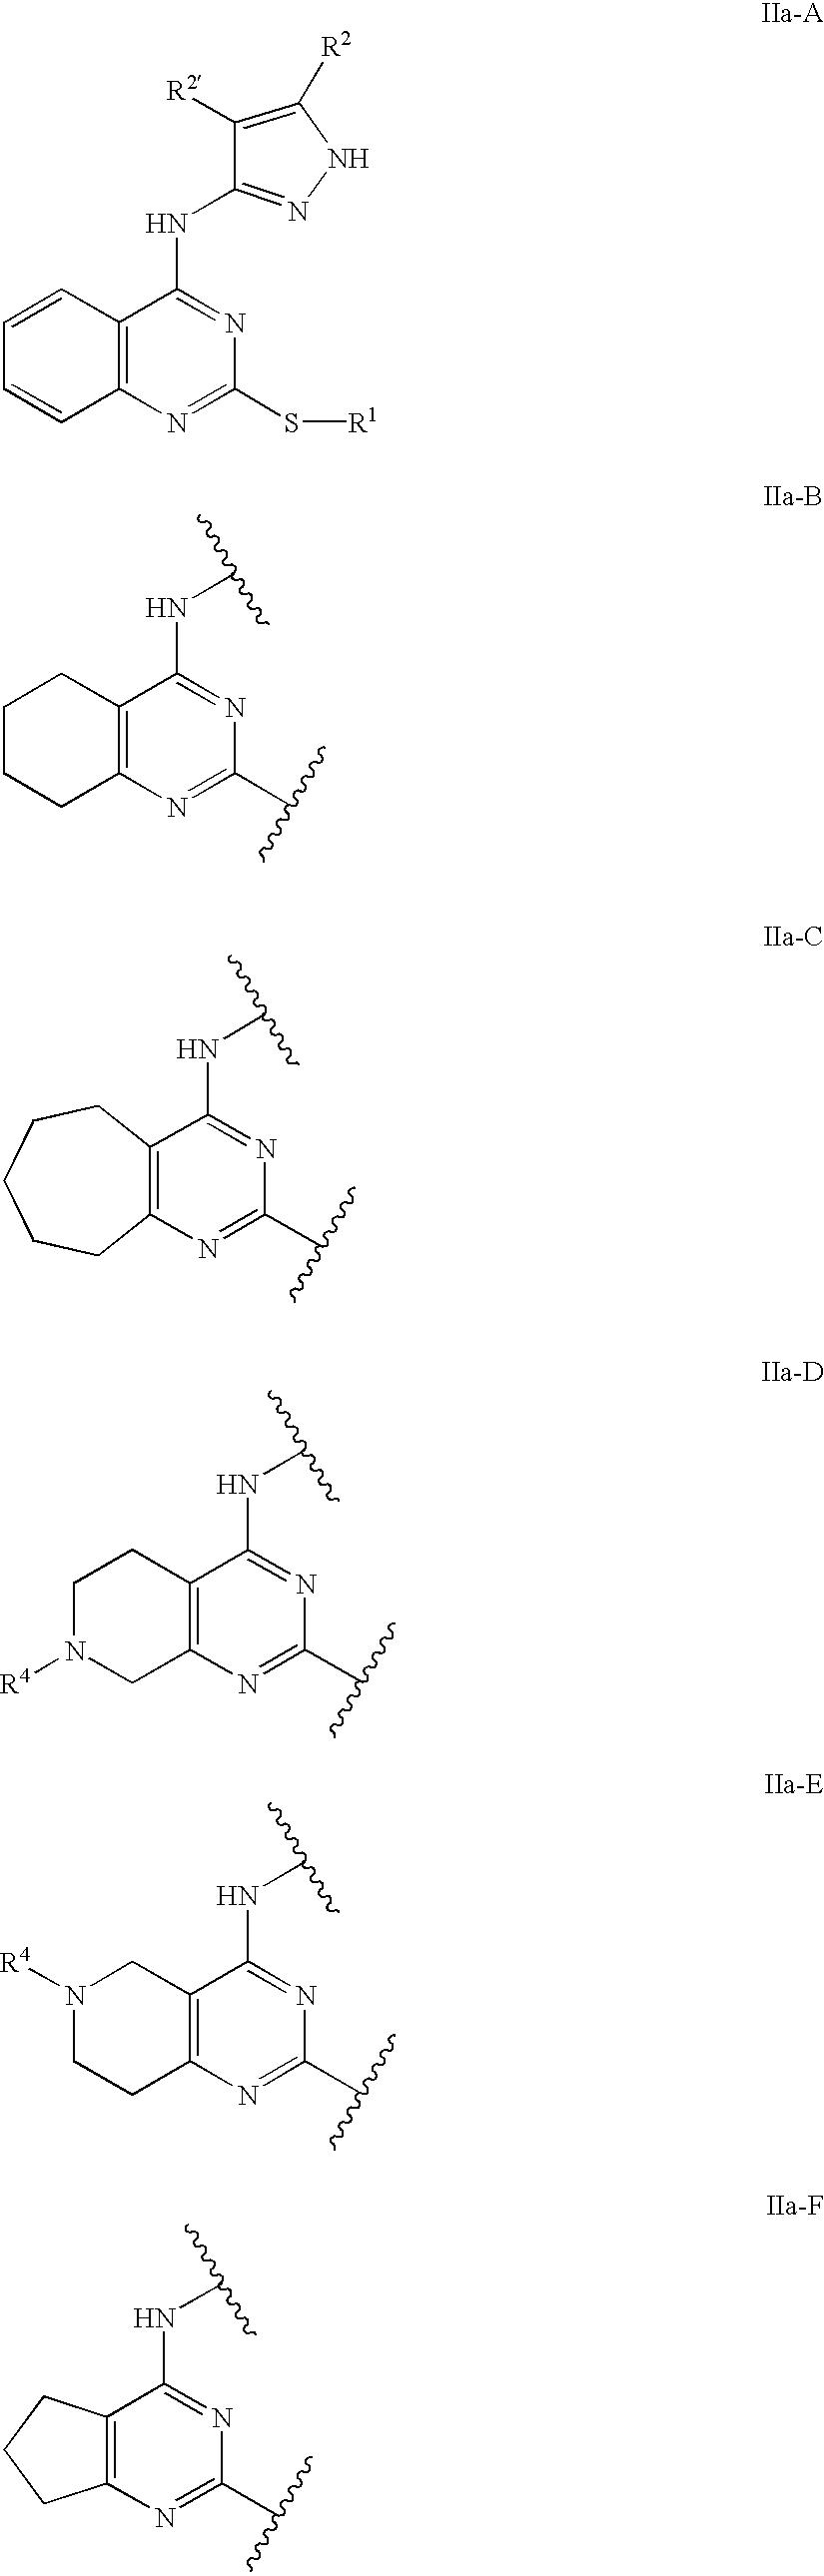 Us6989385b2 Pyrazole Compounds Useful As Protein Kinase Inhibitors Bolens 1253 Wiring Diagram Figure Us06989385 20060124 C00011